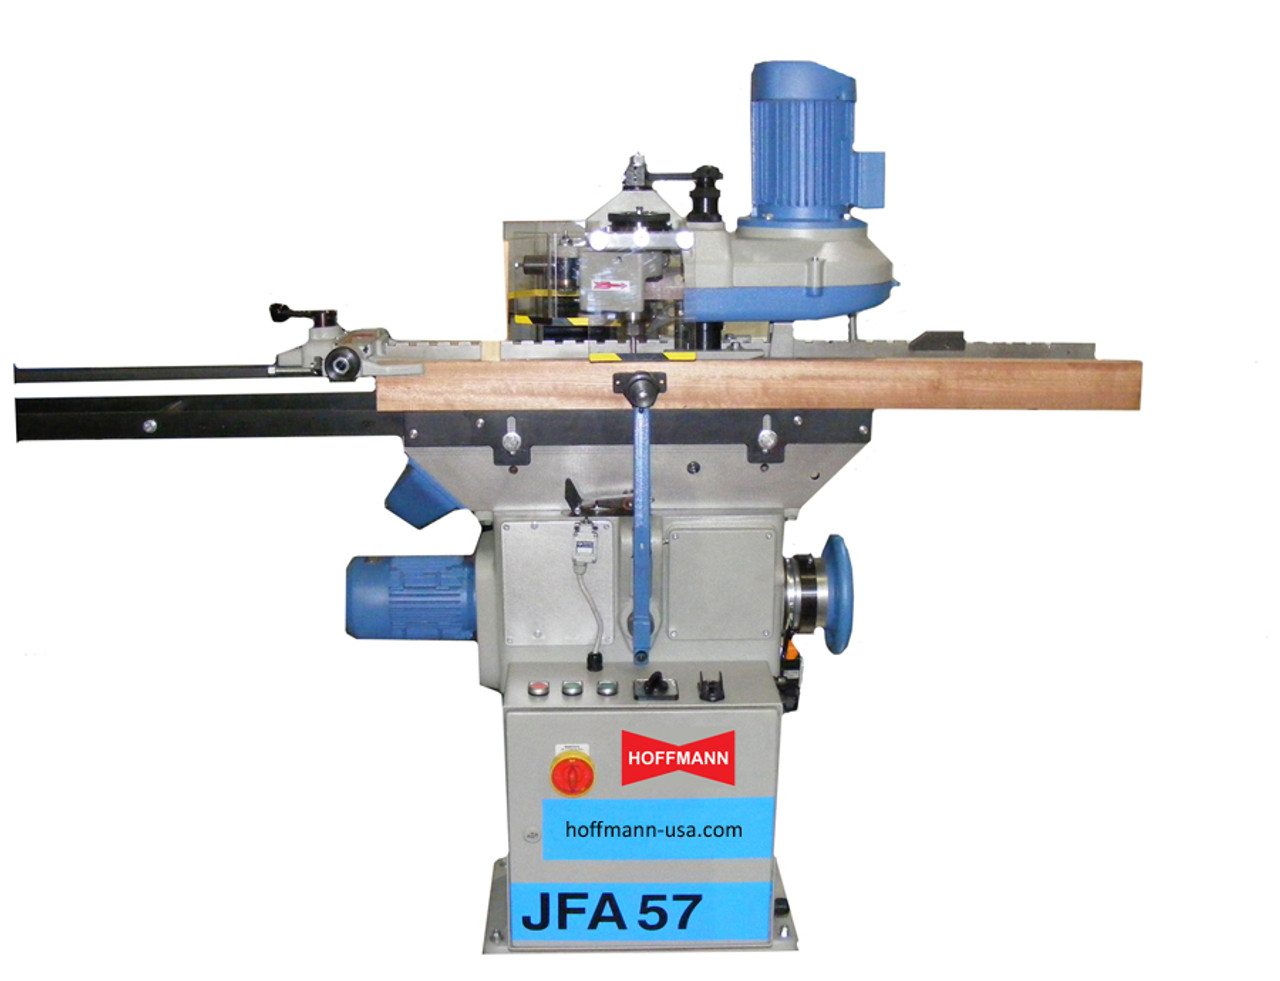 Hoffmann JFA 57 Louver Grooving Machine, full view,, small.jpg